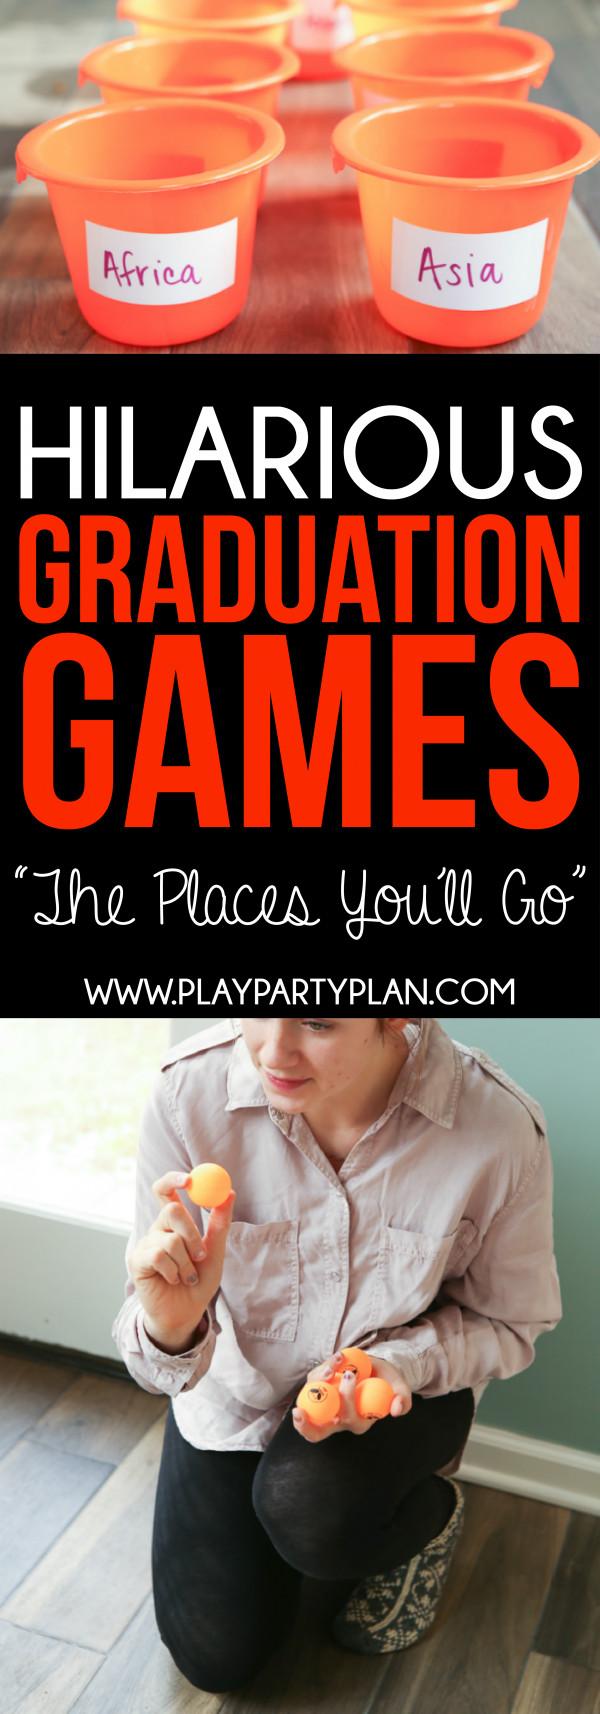 Outdoor Graduation Party Game Ideas  Hilarious Graduation Party Games